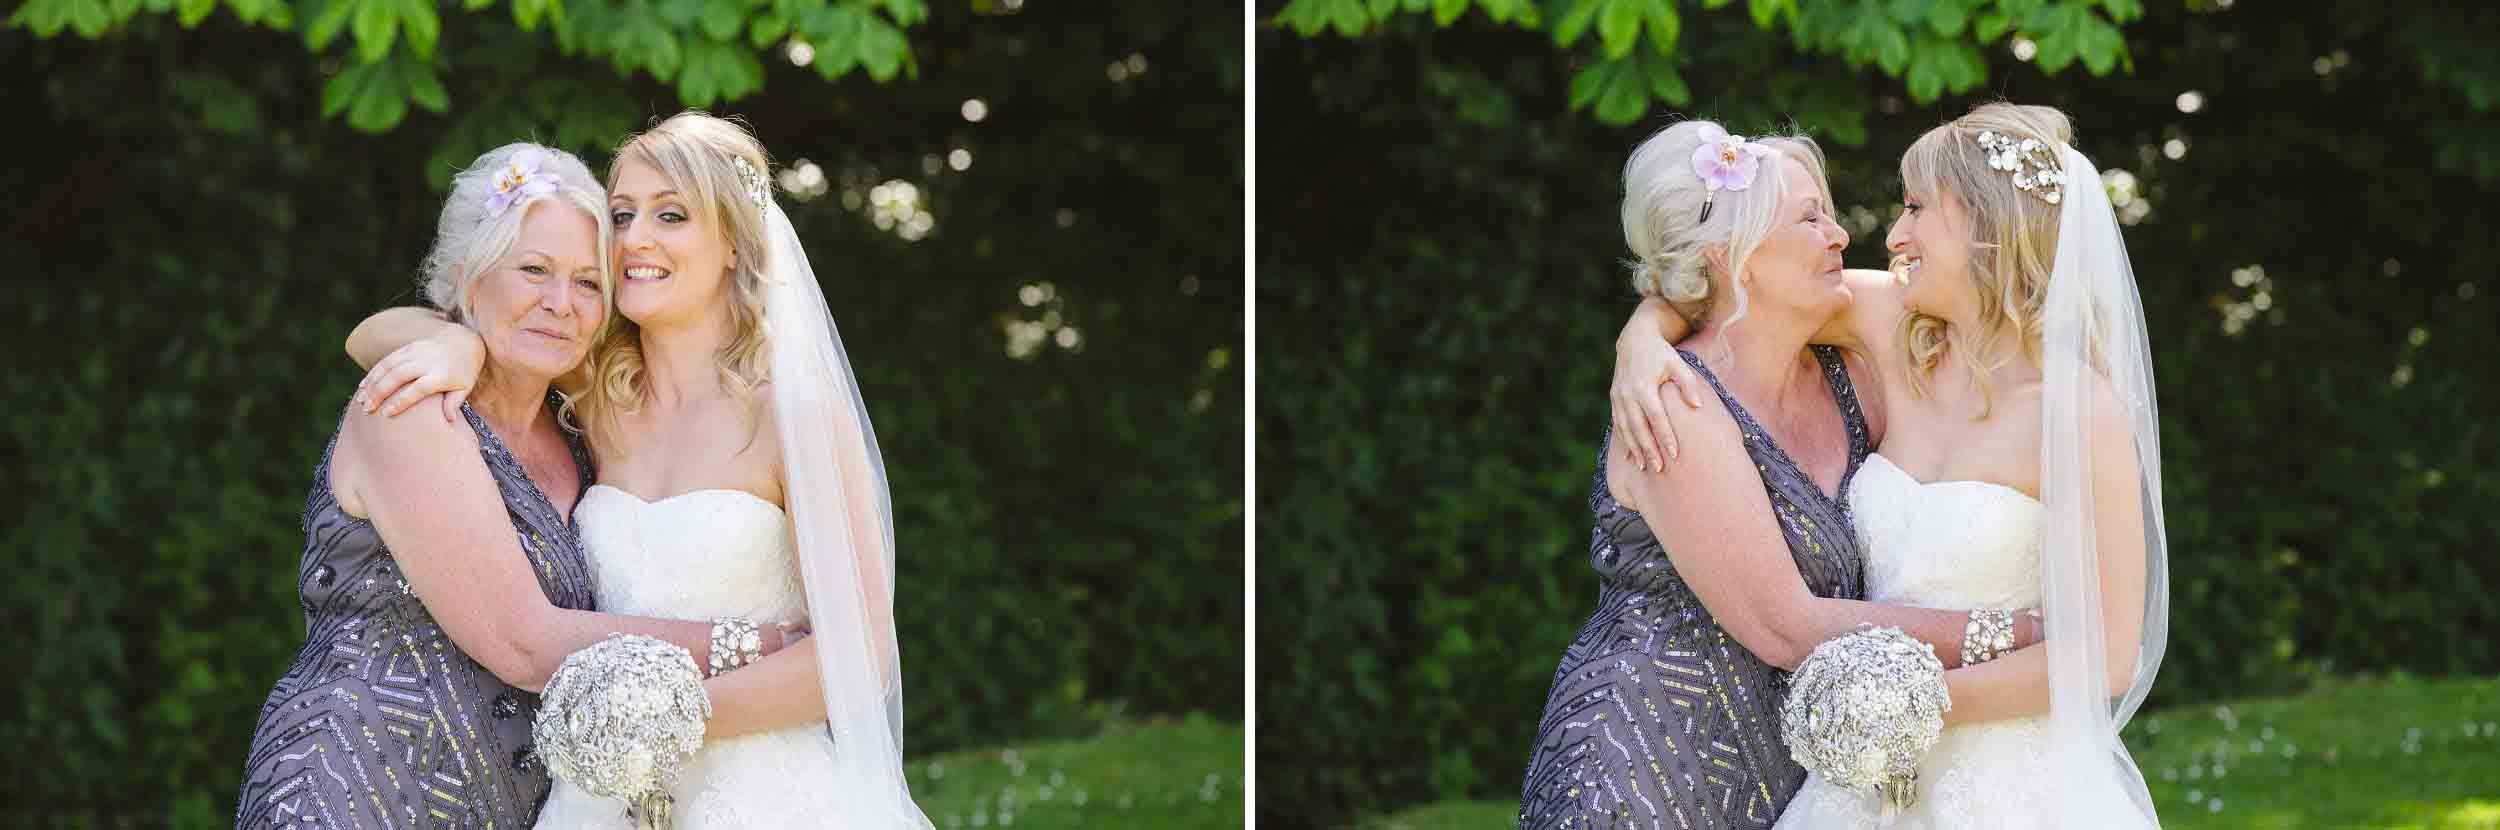 Ellingham-Hall-Wedding-Photographer-56.jpg